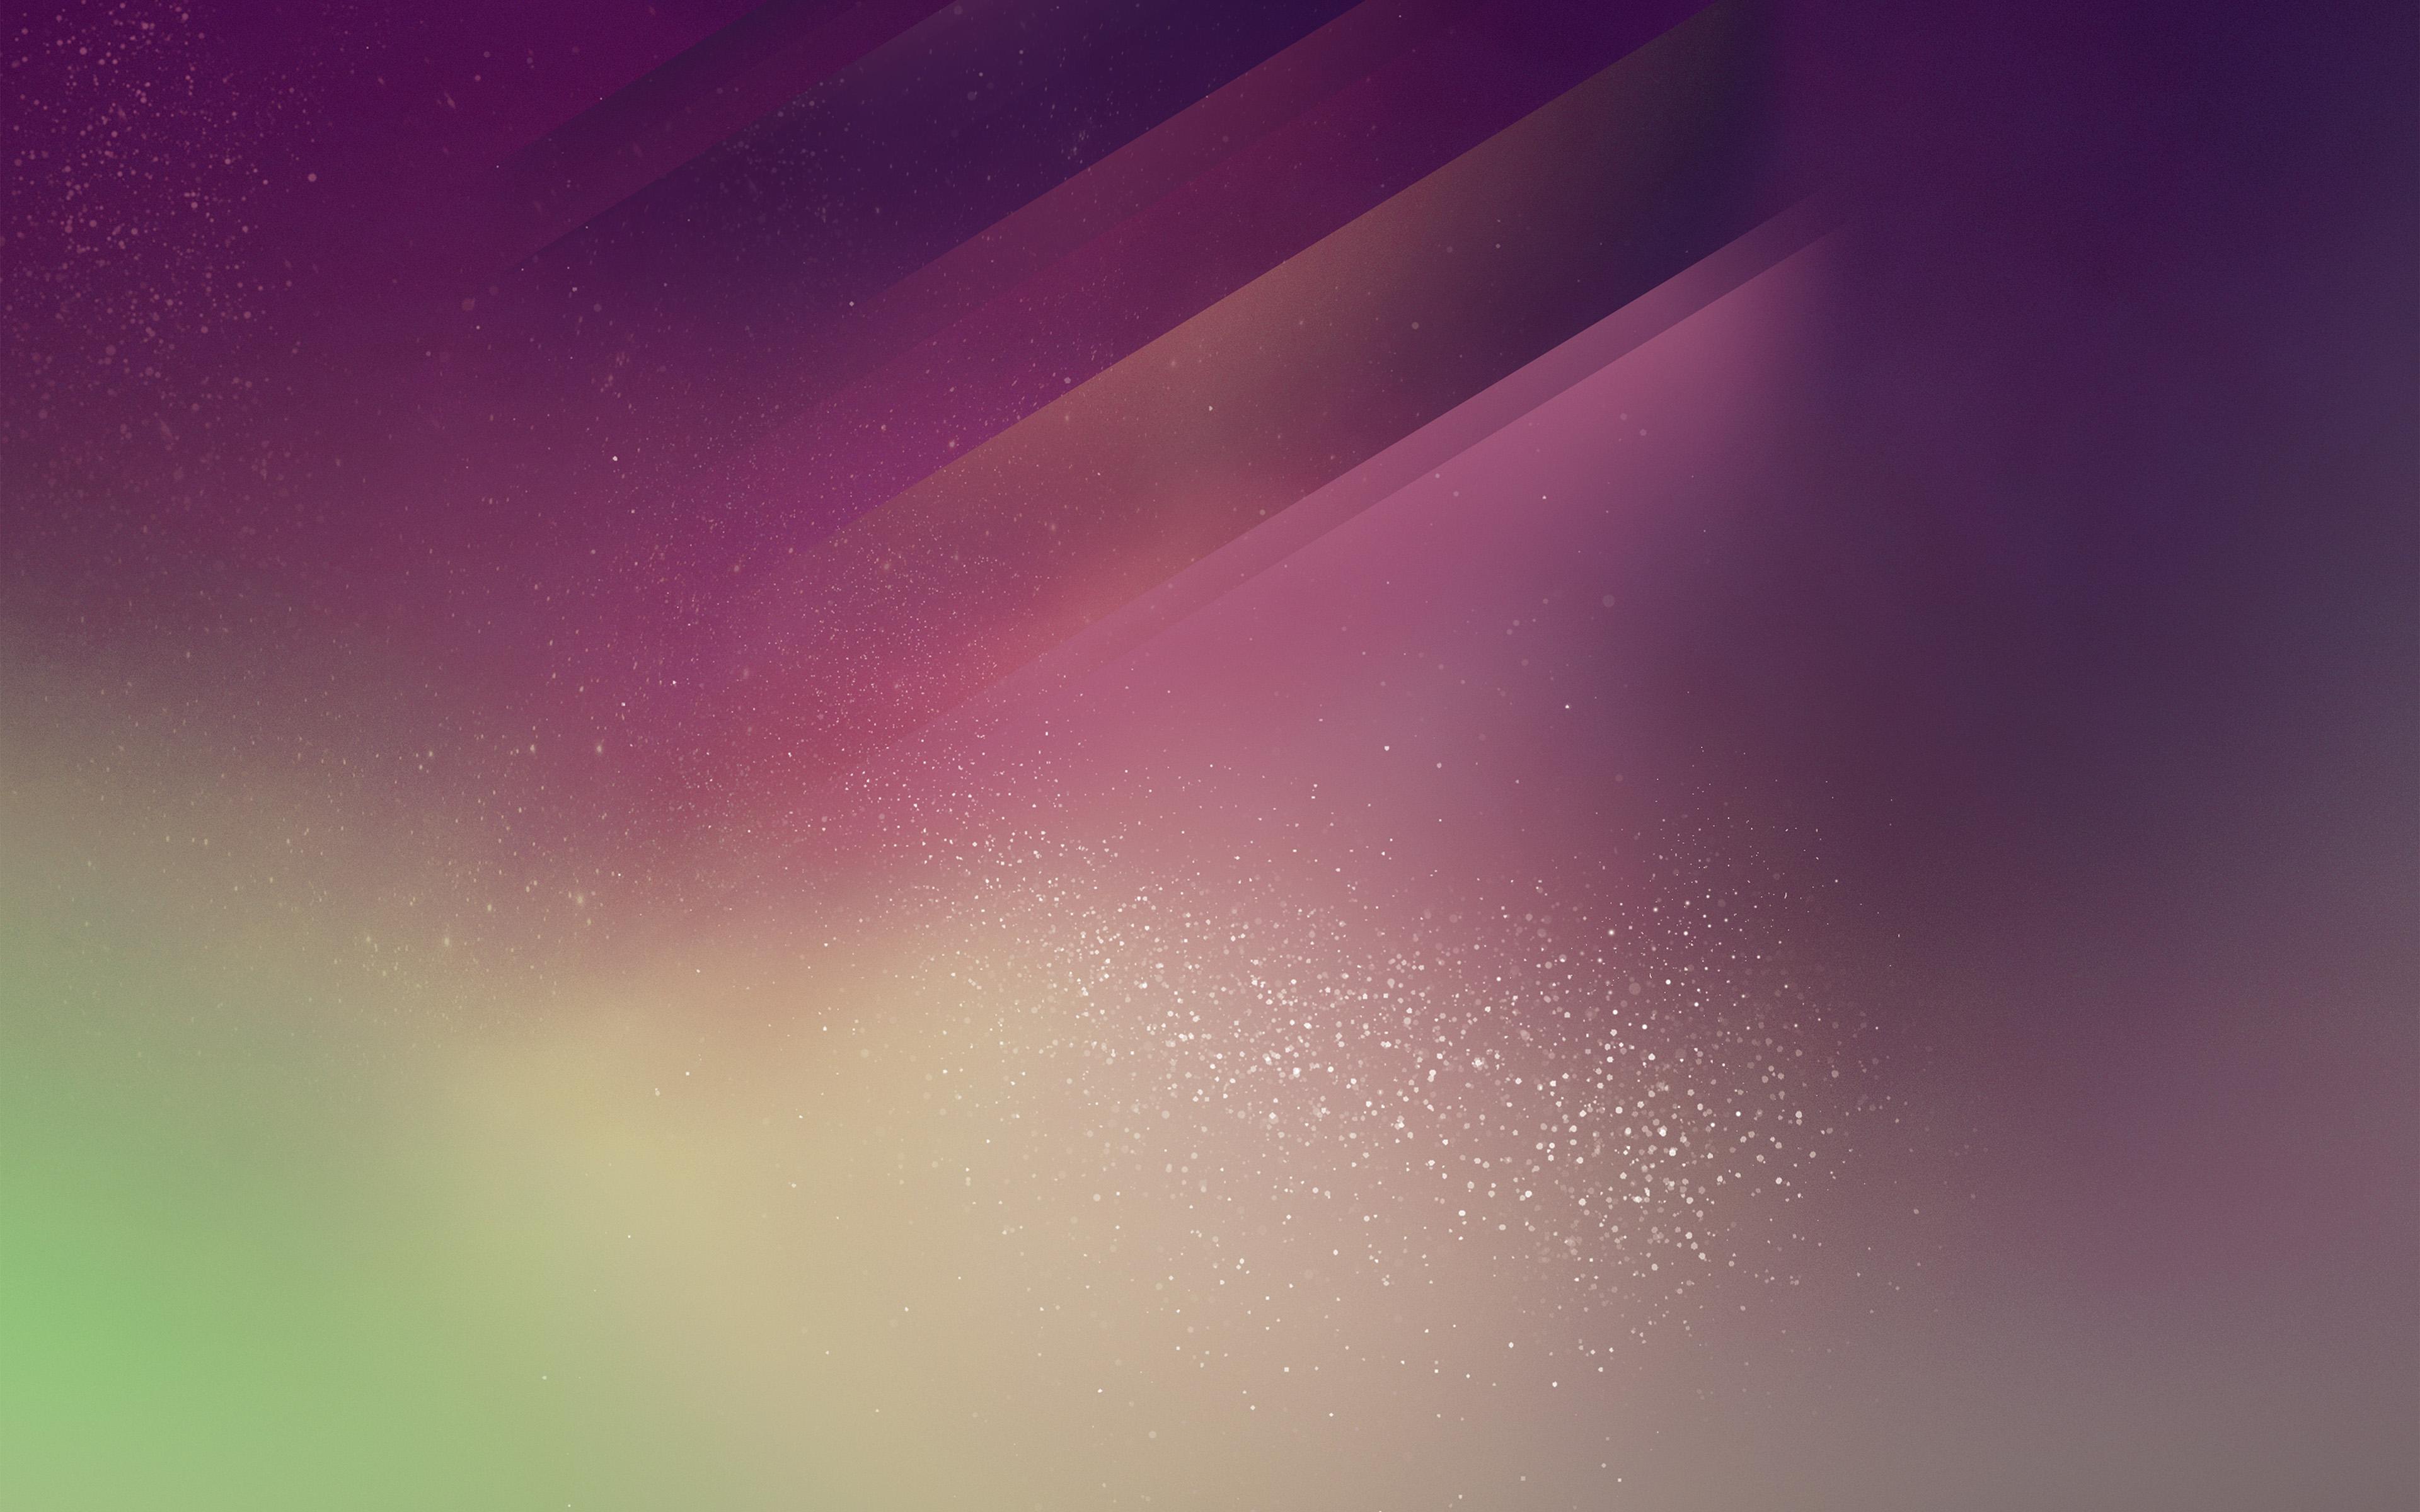 Vw13 Beautiful Galaxy S8 Samsung Purple Pattern Background Wallpaper